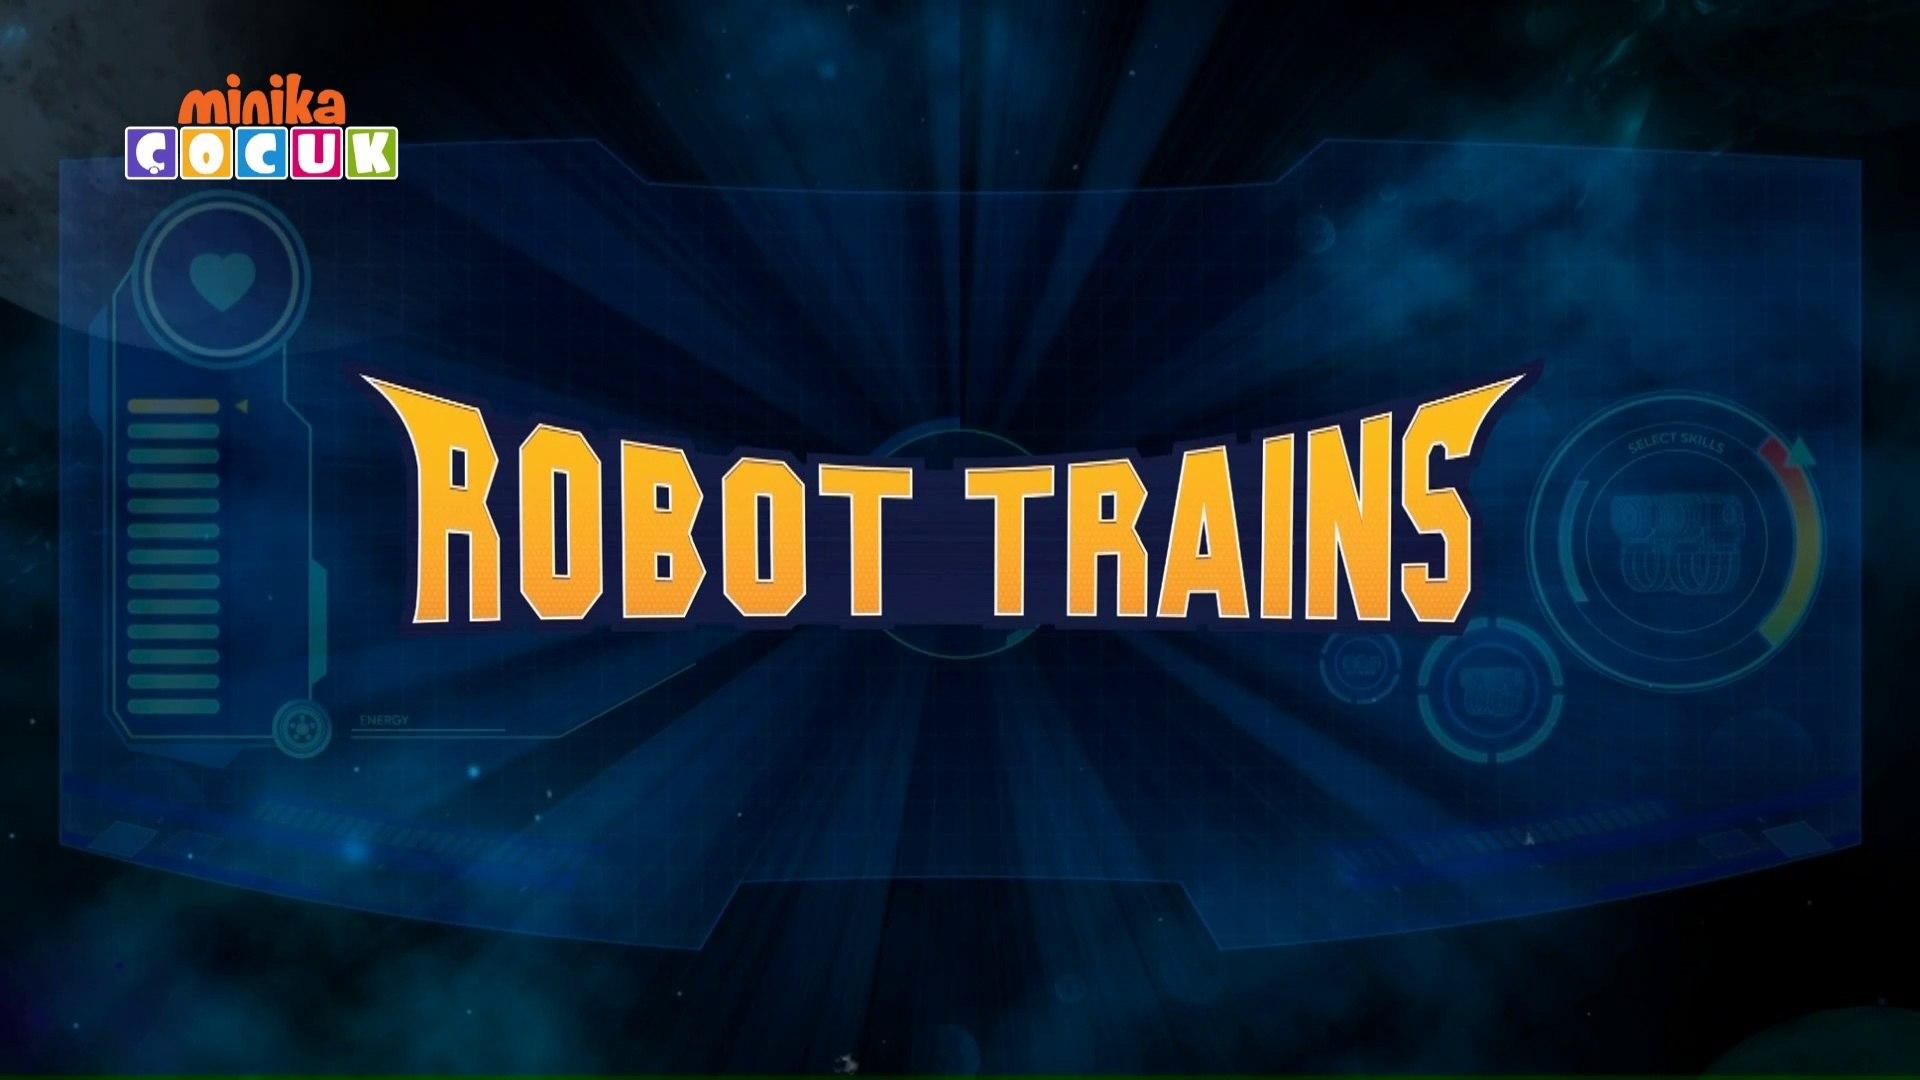 Robot Trenler Macera Basliyor 1 Bolum Minika Dailymotion Video